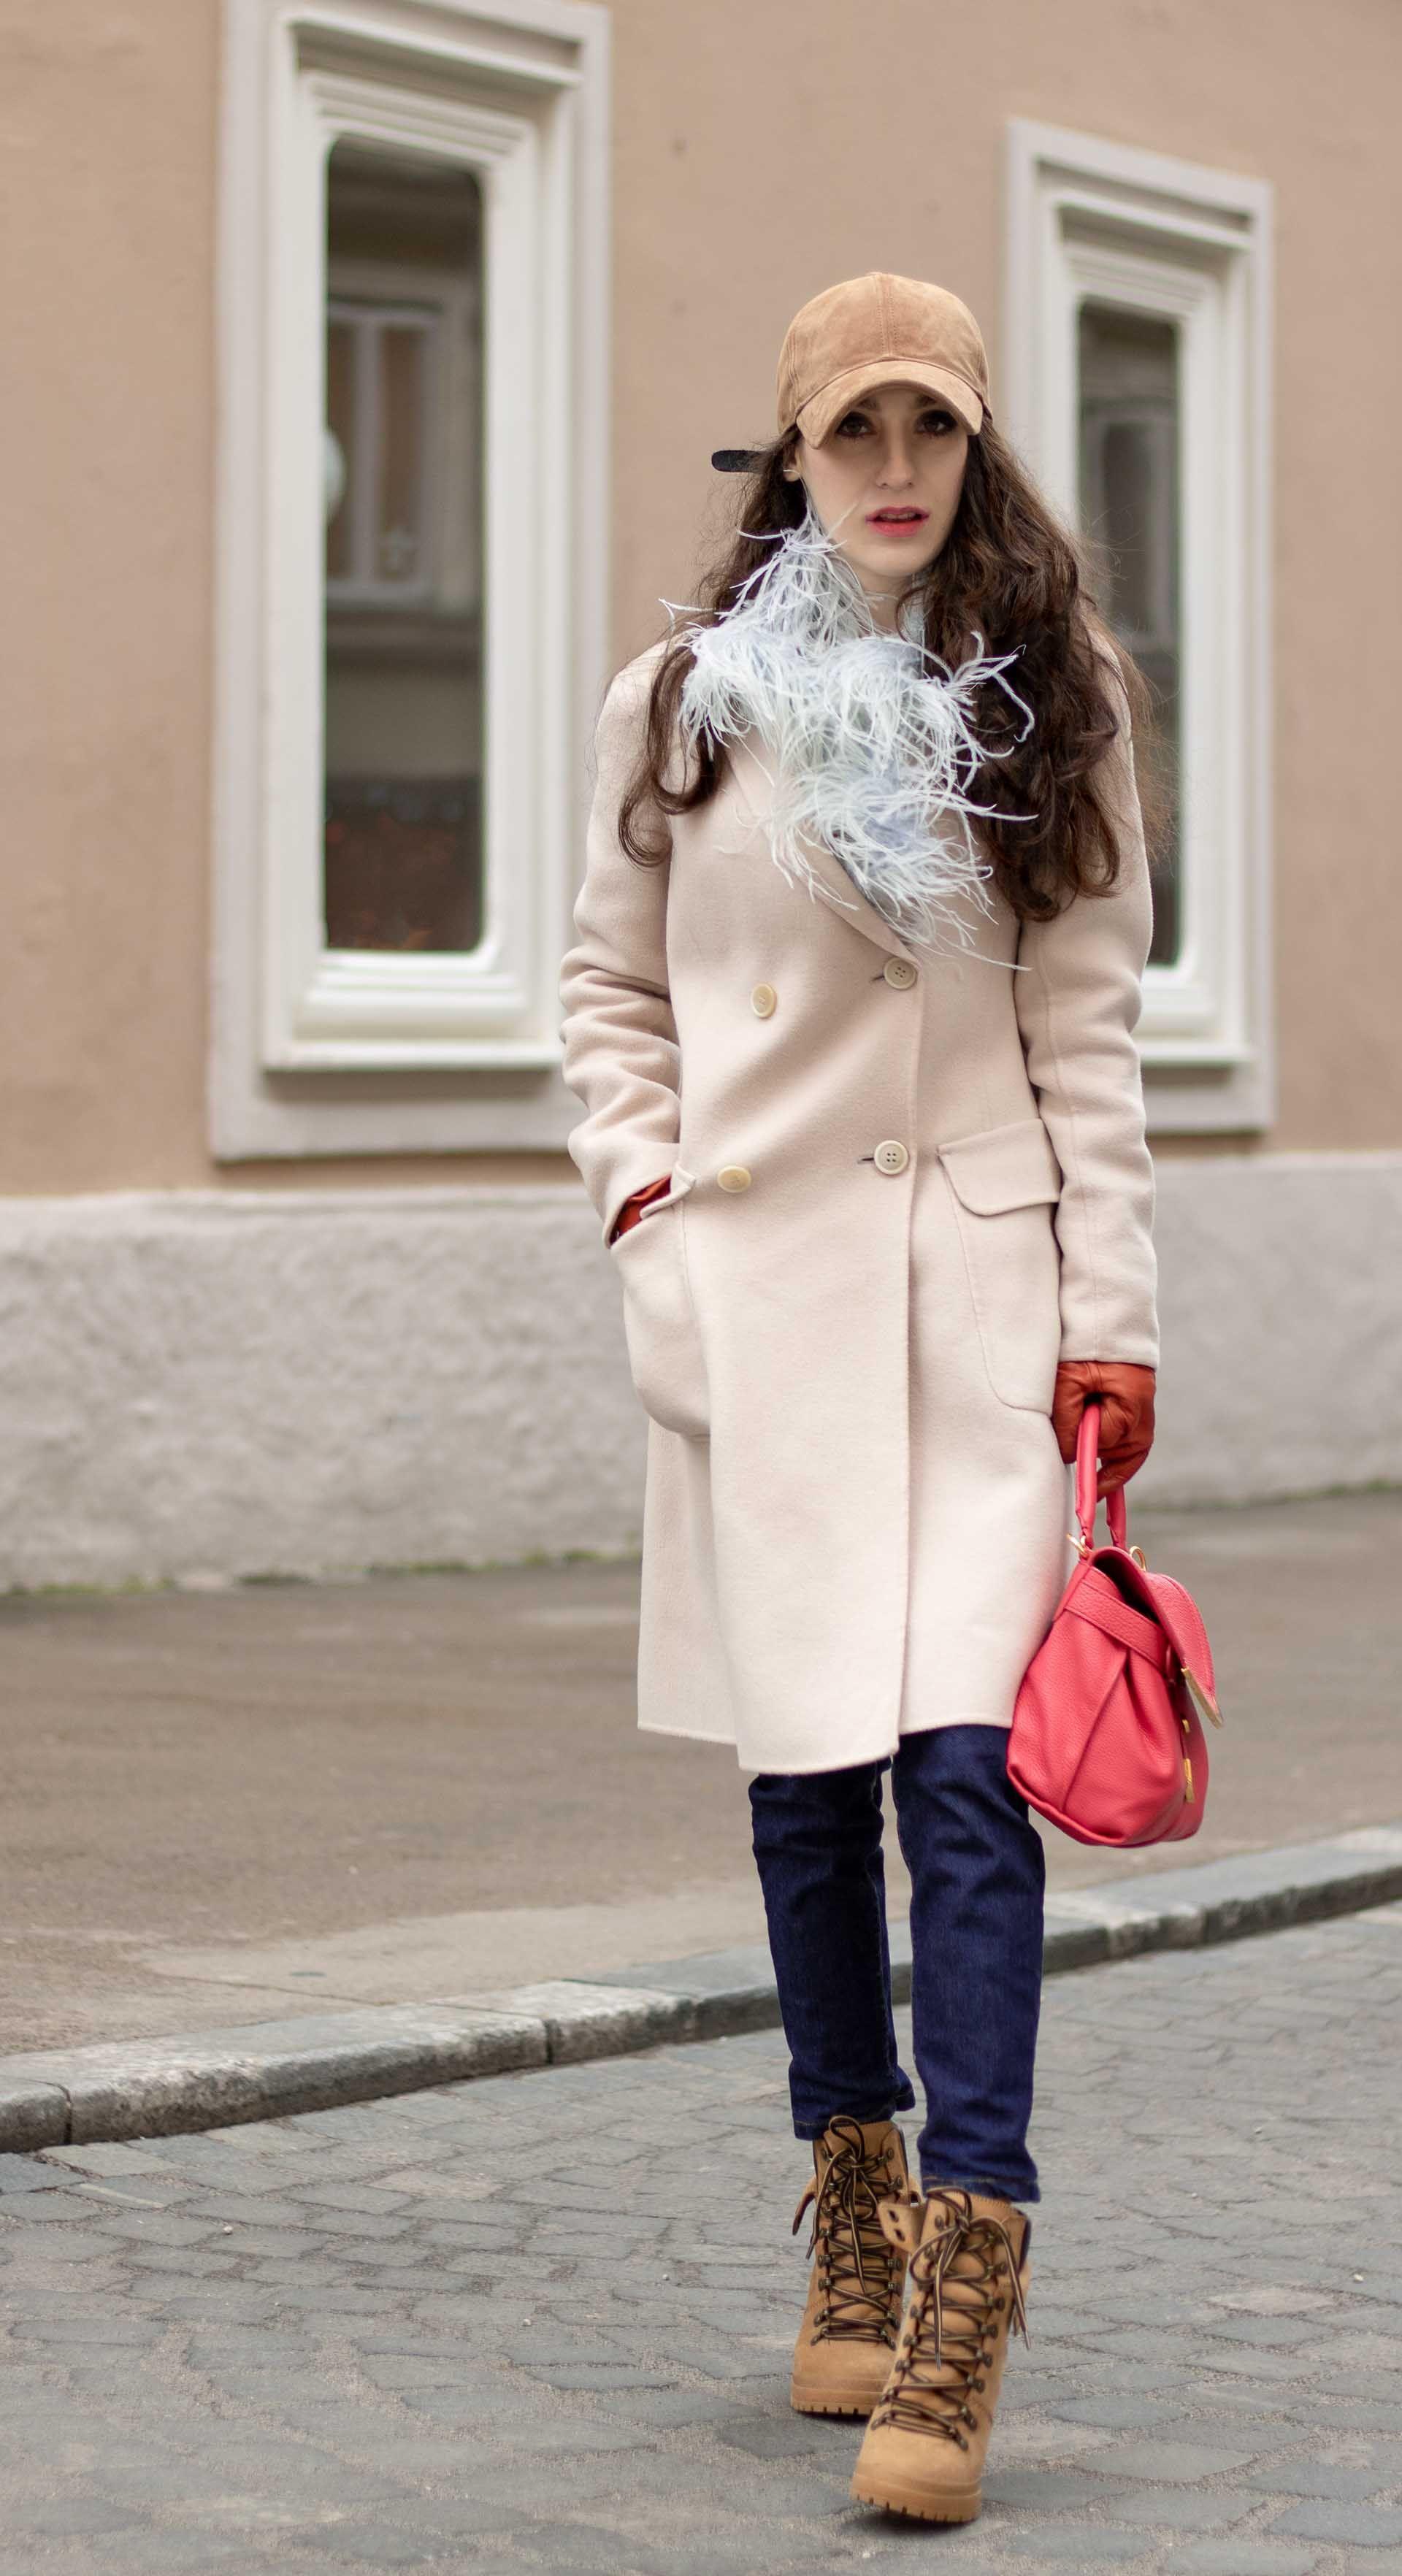 fefde5a925c Must follow fashion blogger Veronika Lipar of Brunette from Wall Street  dressed in brown Rag   Bone baseball cap